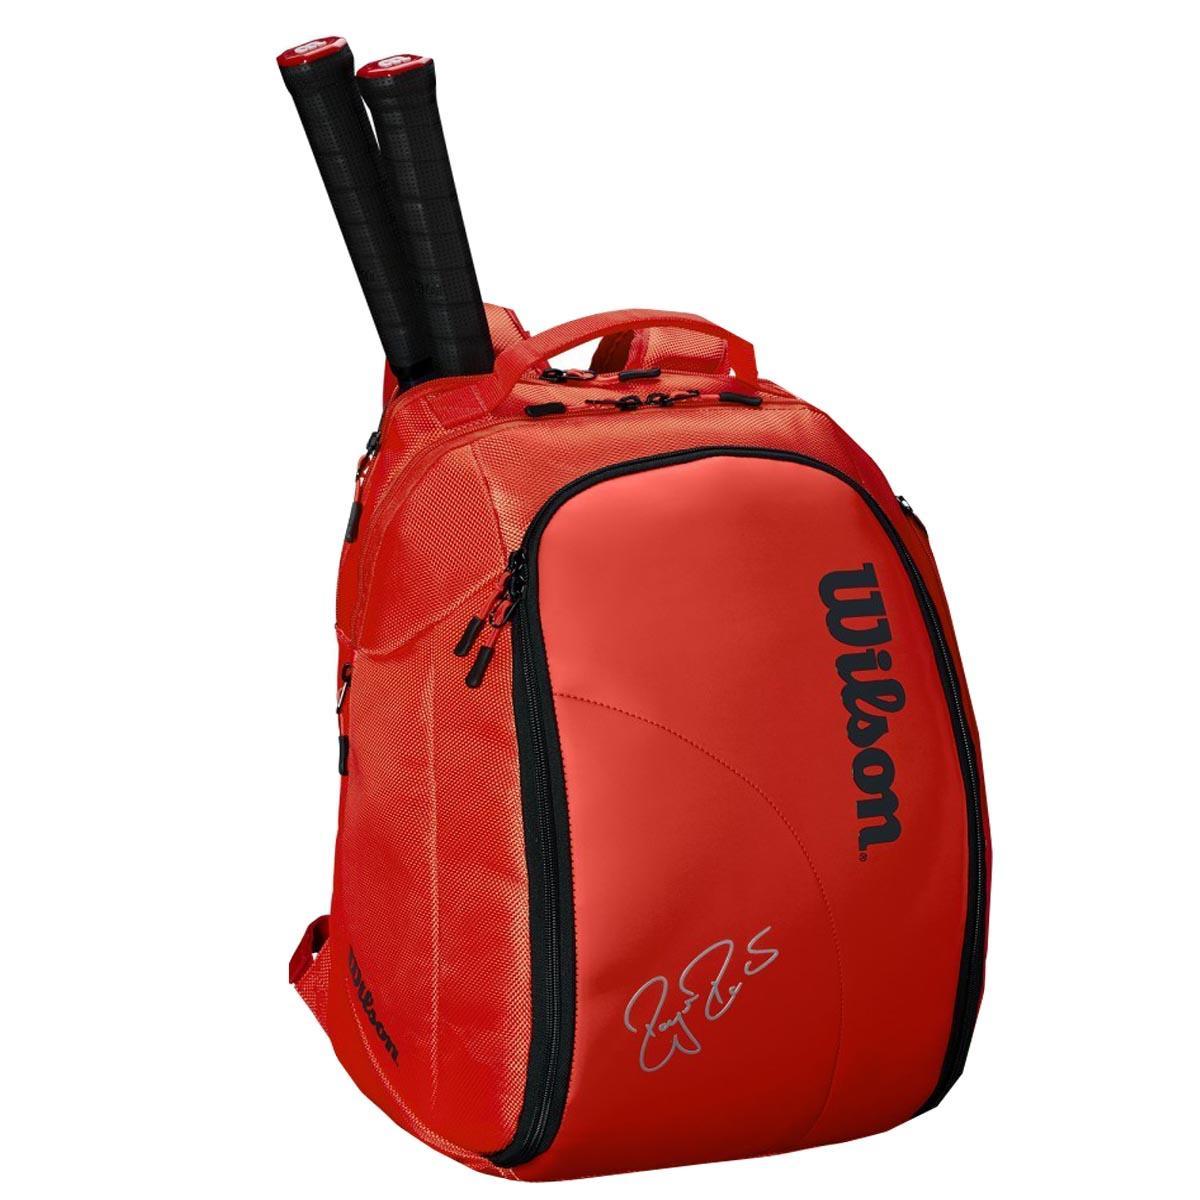 Buy Wilson Federer Dna Tennis Backpack Infrared Online